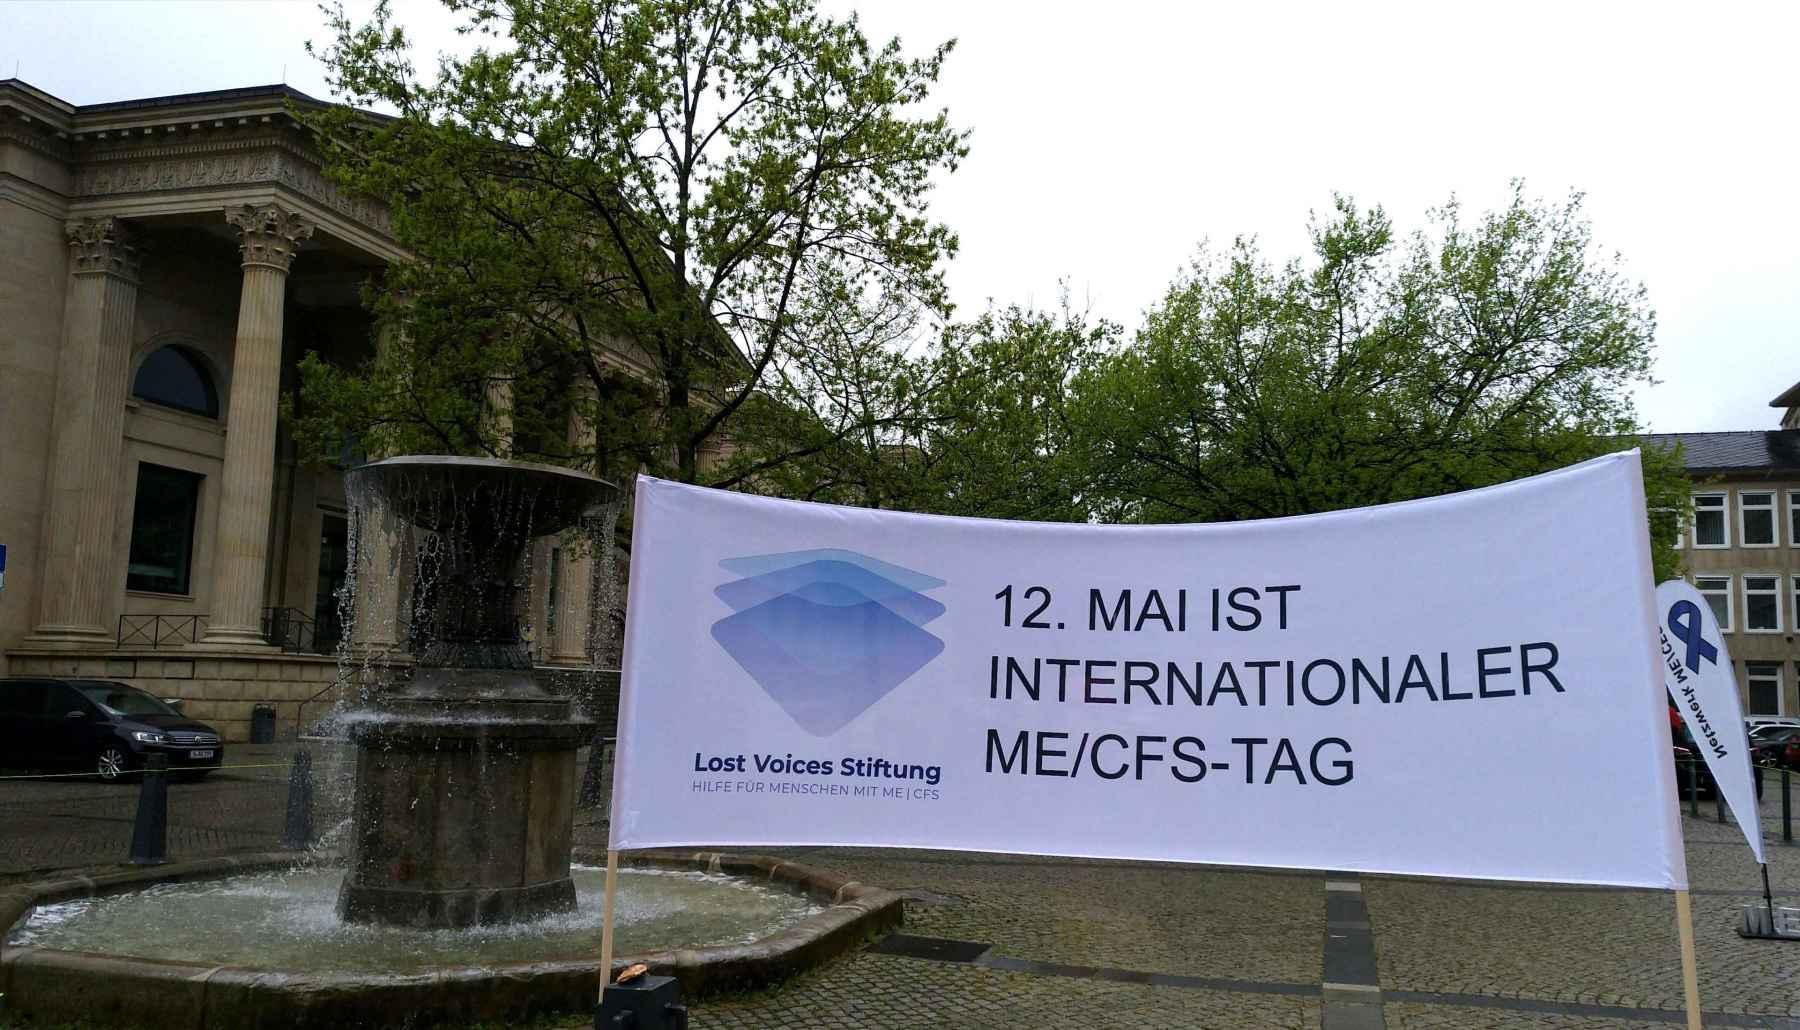 Internationaler ME/CFS-Tag